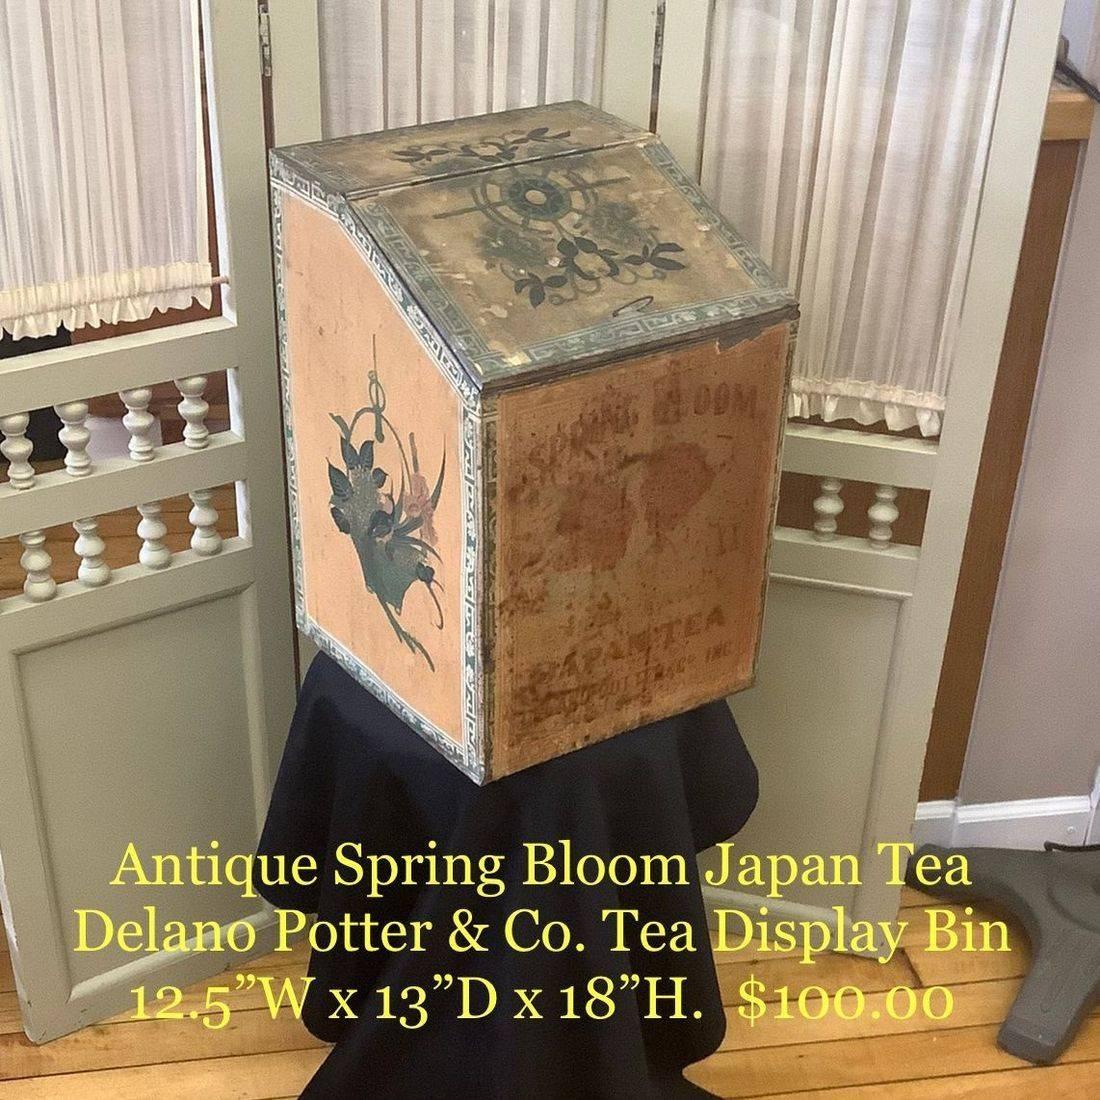 Antique Spring Bloom Japan Tea Delano Potter & Co. Tea Display Bin   $100.00